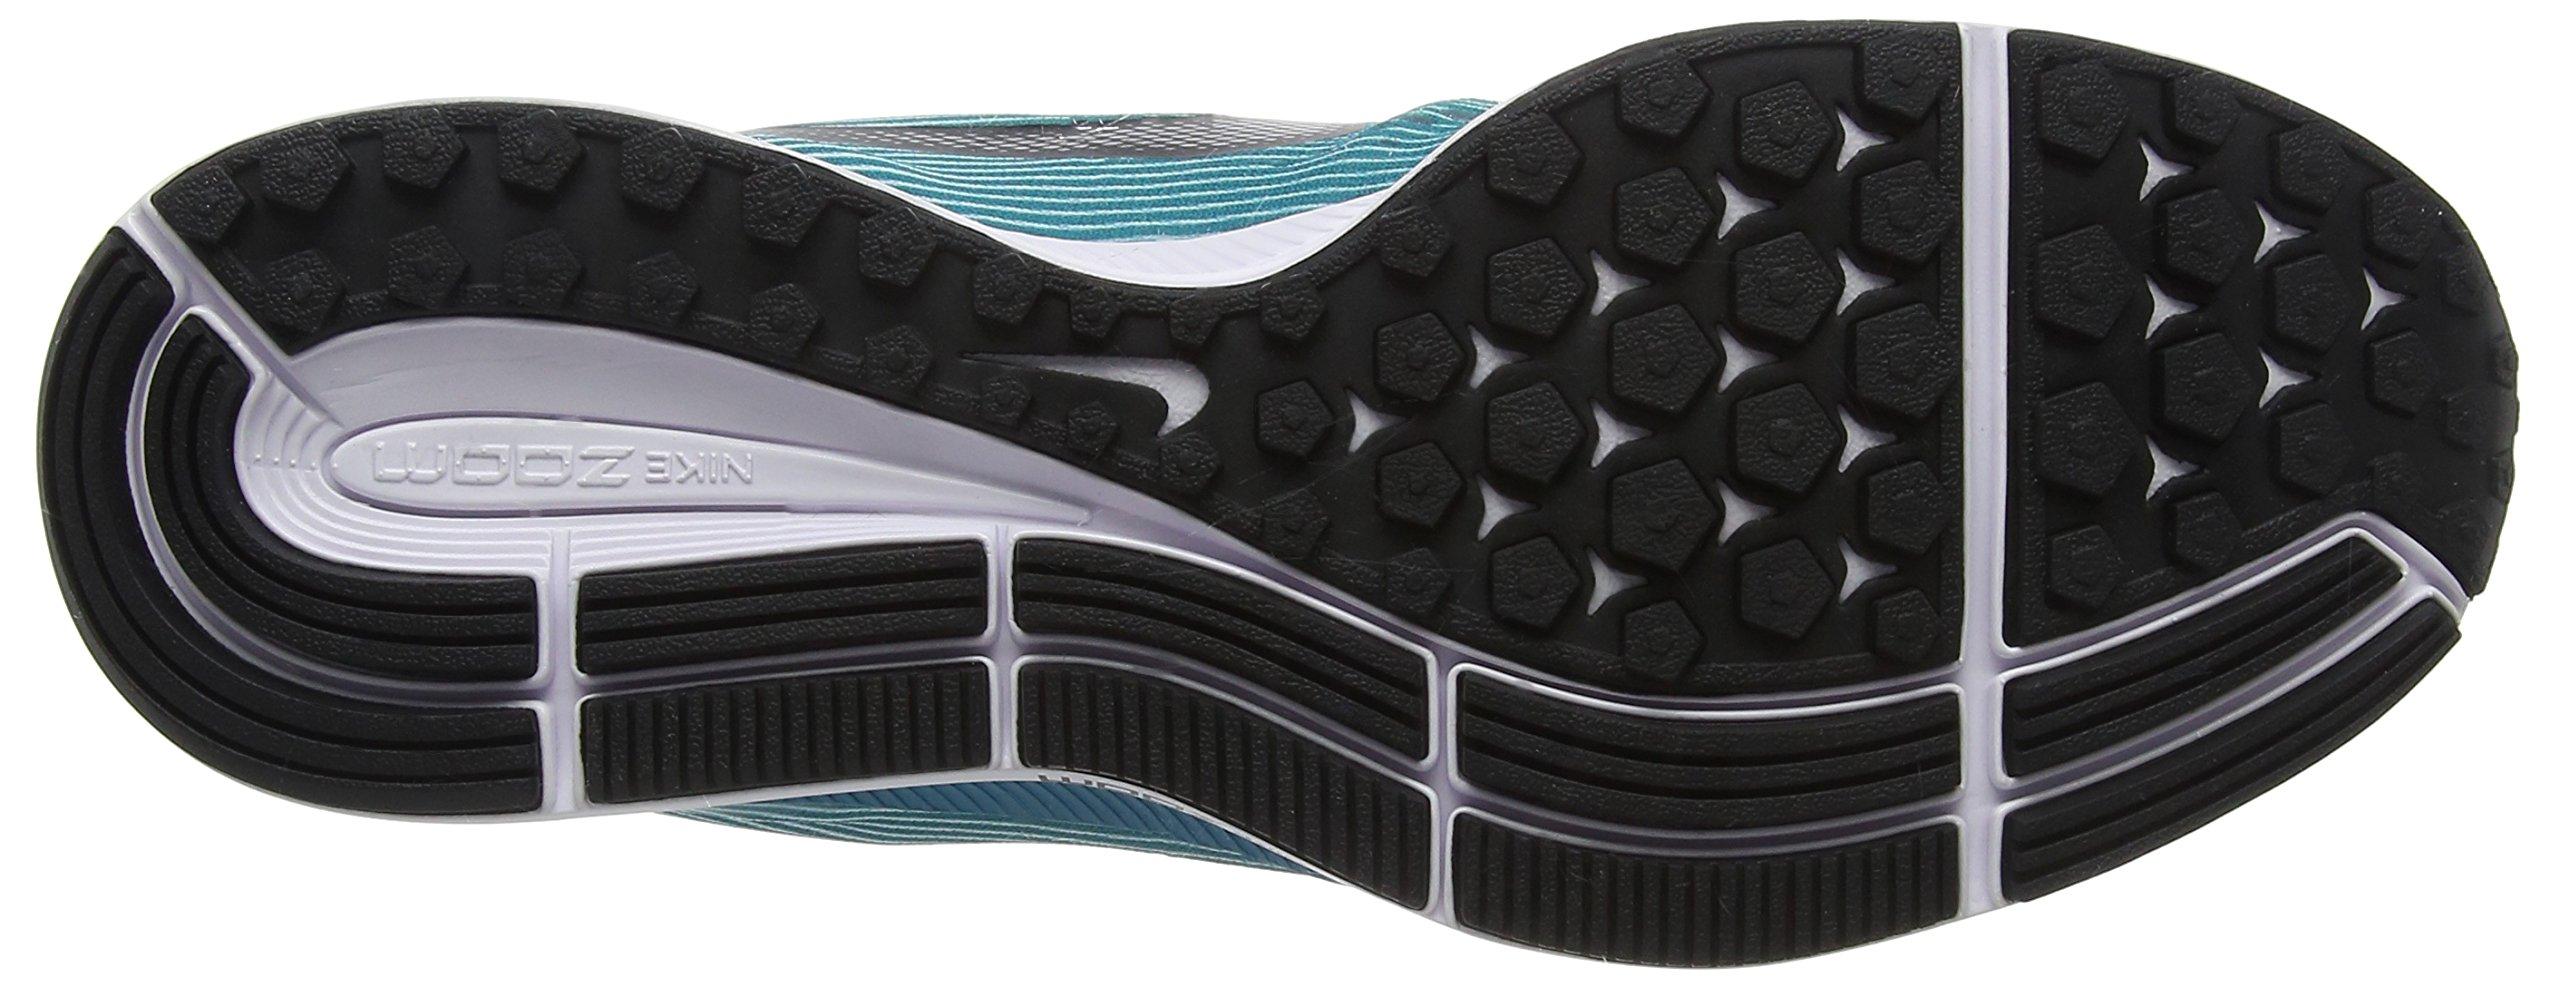 Nike Men's Air Zoom Pegasus 34 White / Black - Blustery 880555-101 (11.5) by NIKE (Image #3)